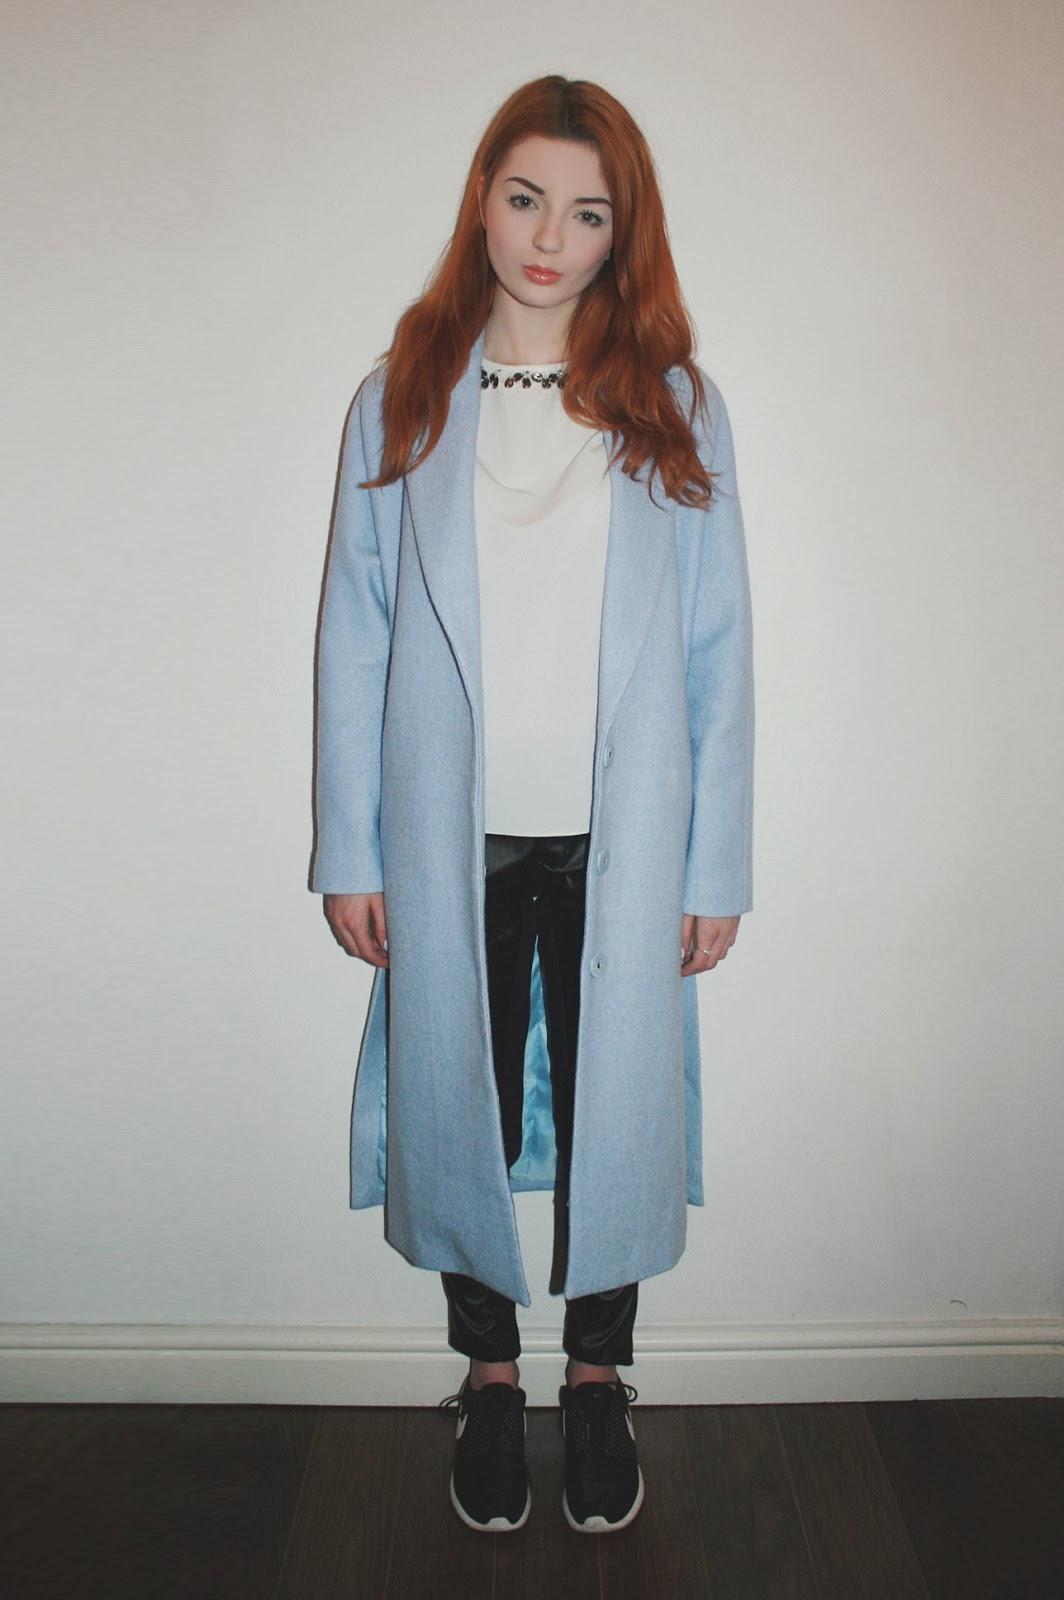 Baby Blue Coat Archives Hannah Louise Fashion